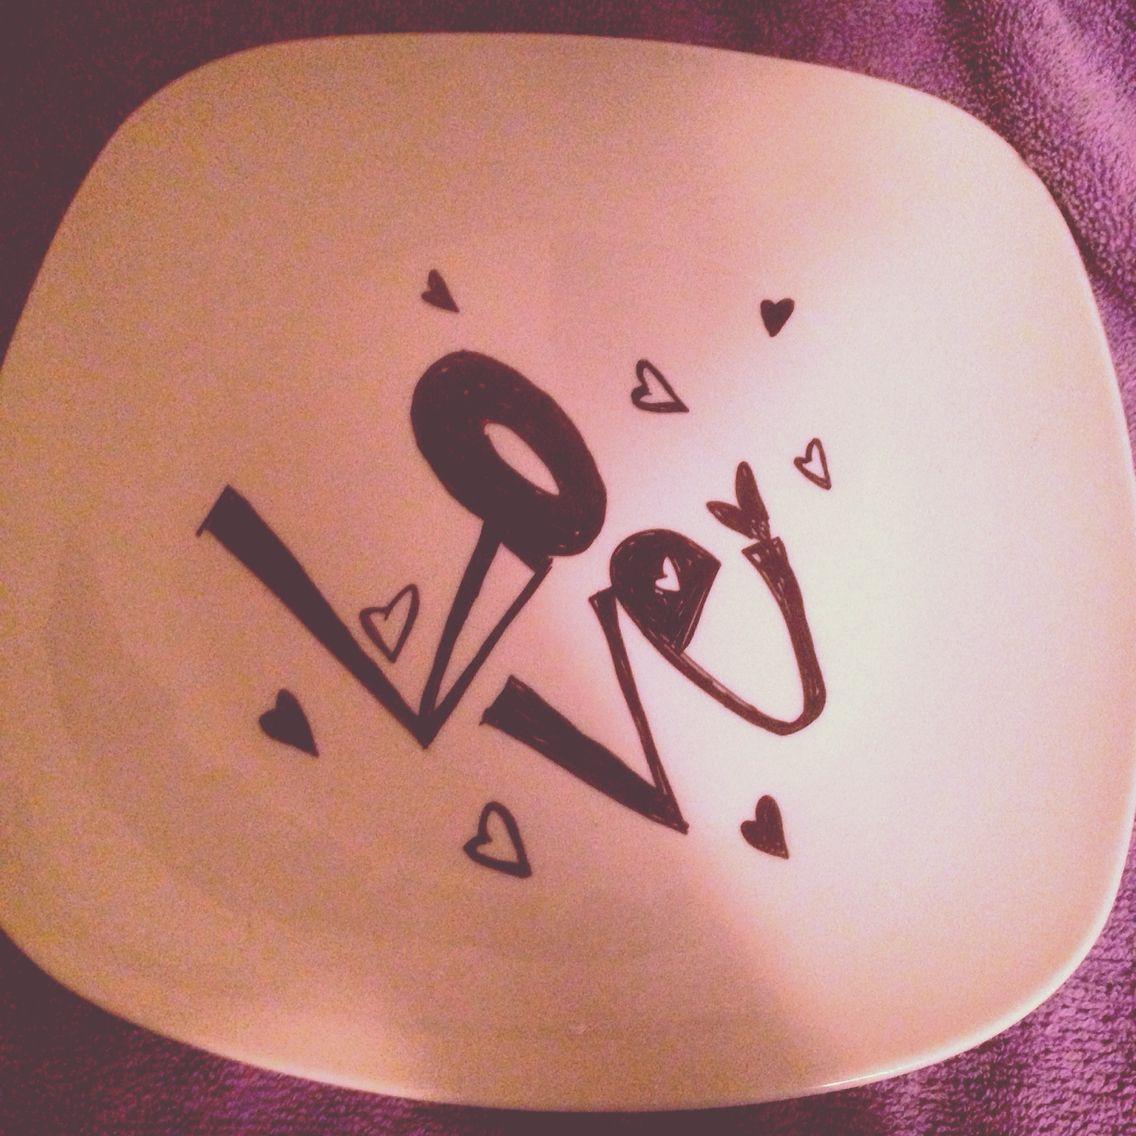 Sharpie designed plate